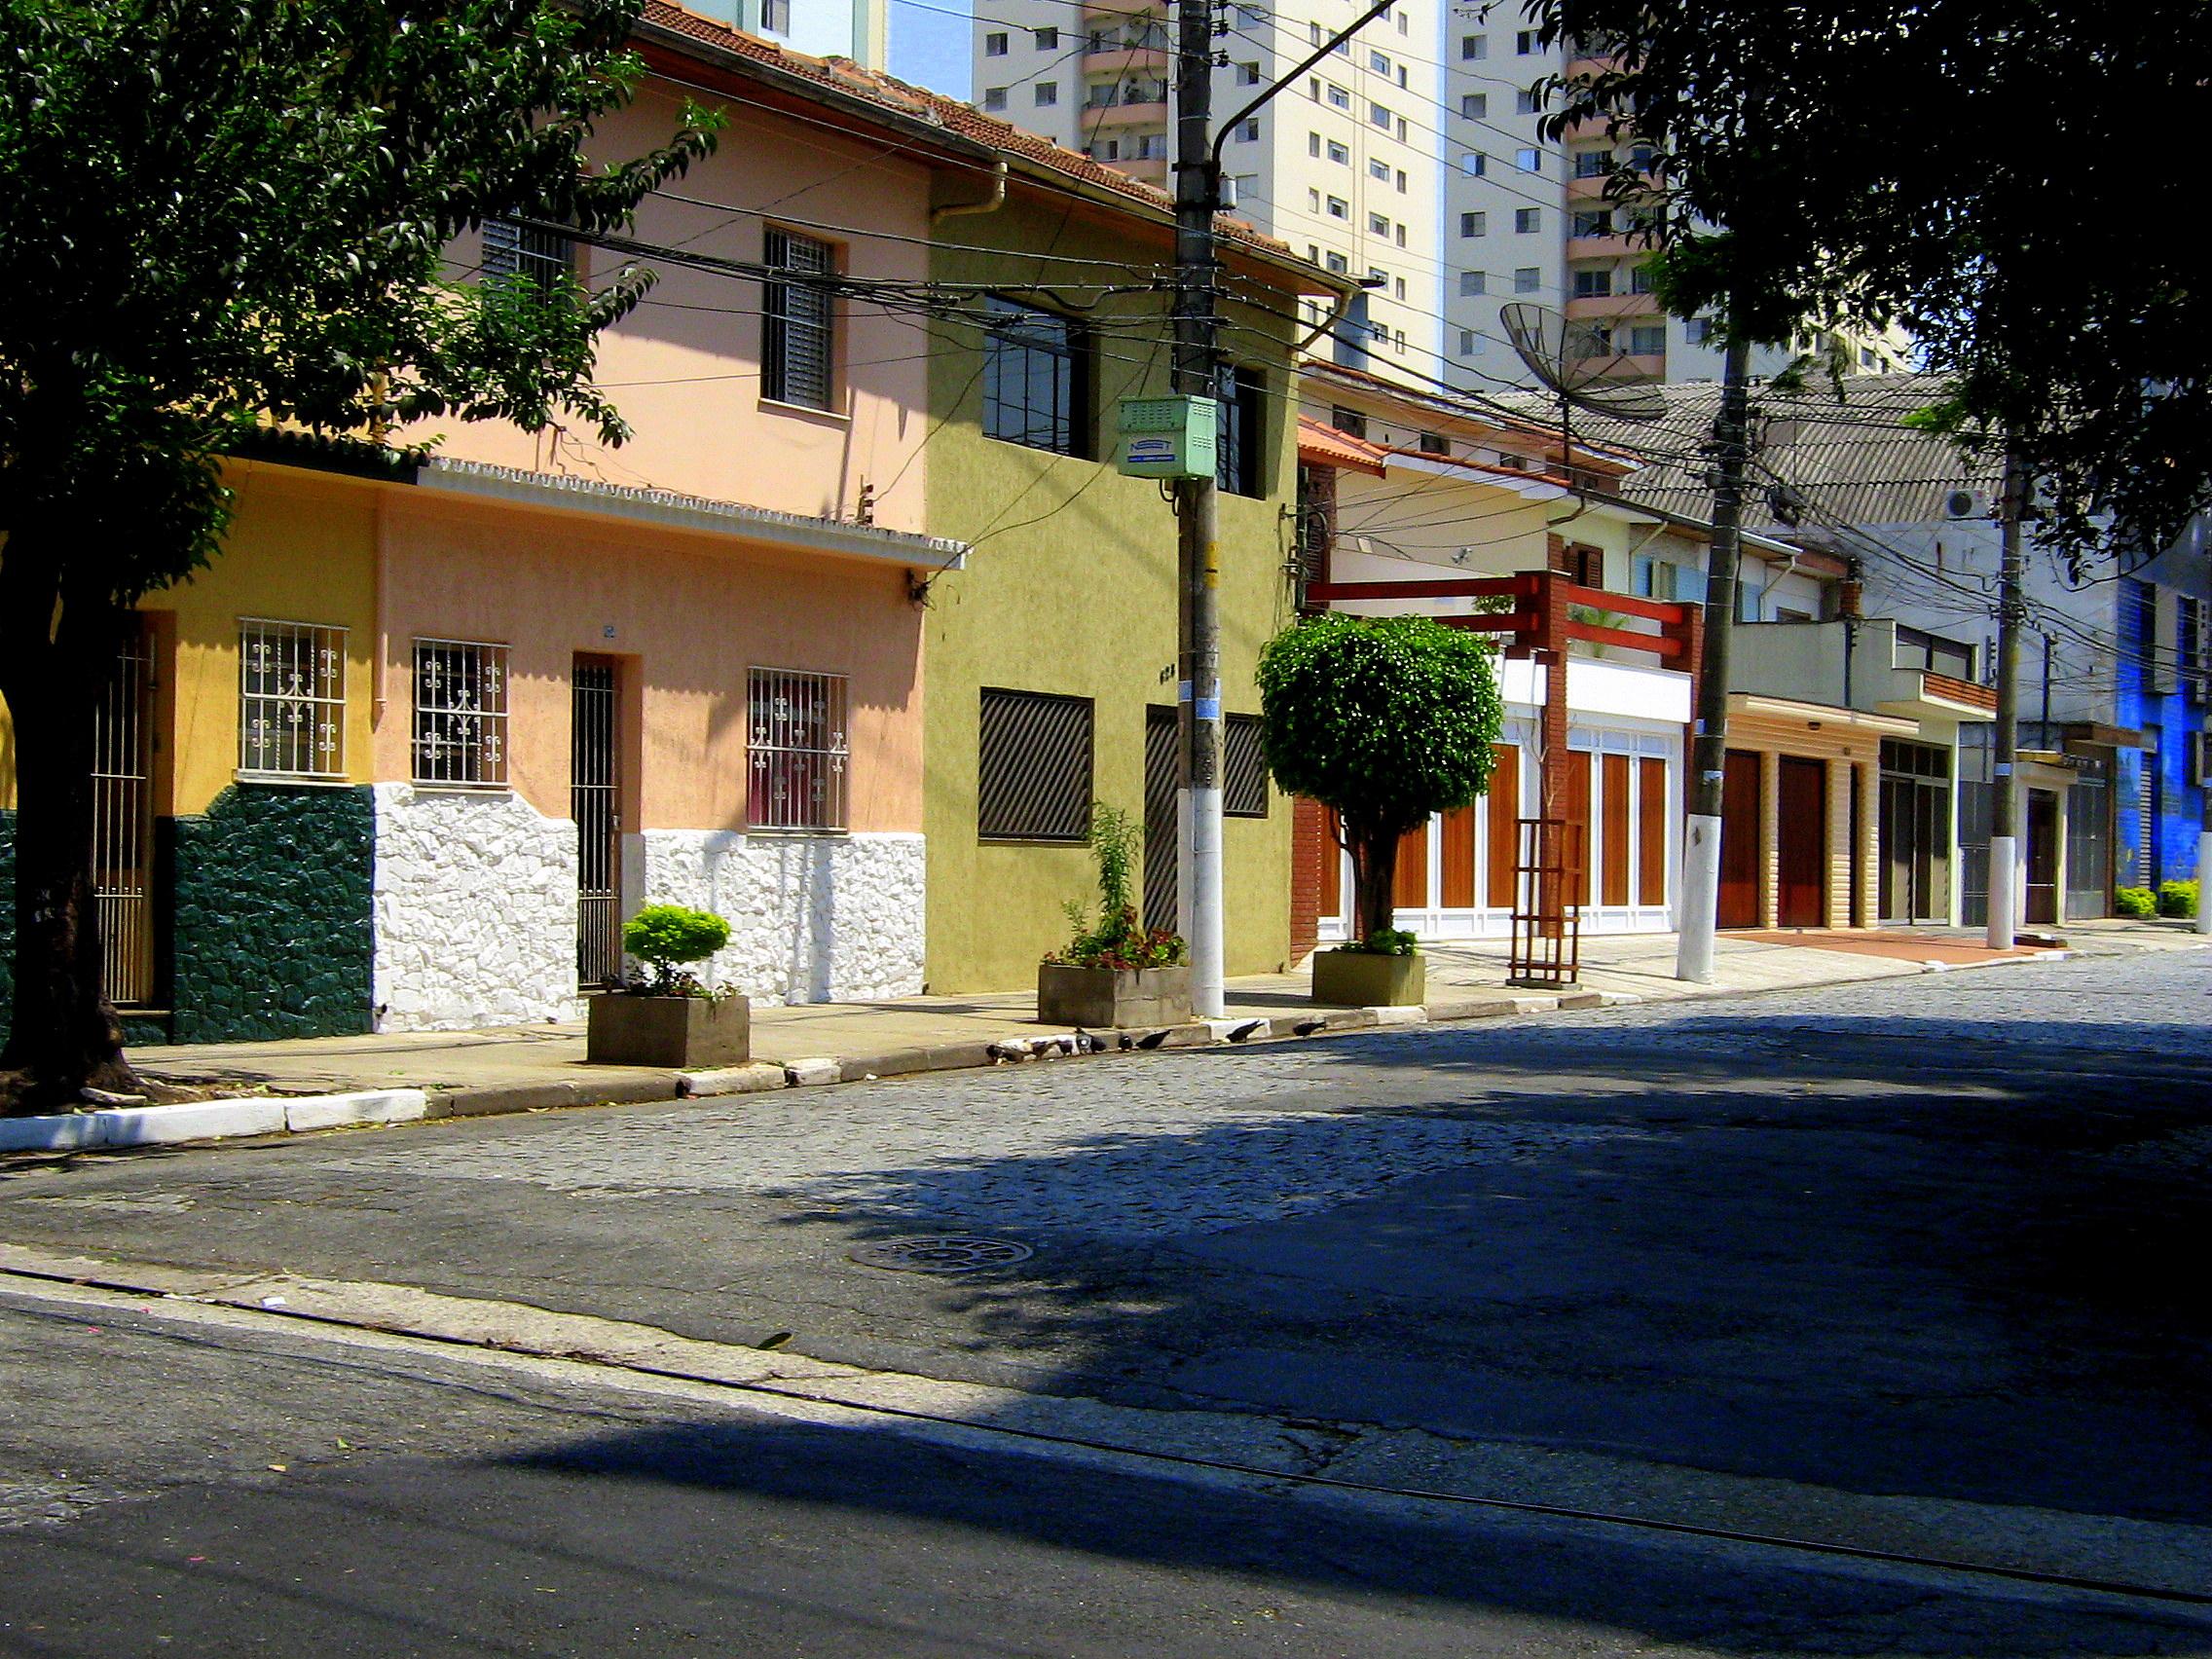 Platina São Paulo fonte: upload.wikimedia.org